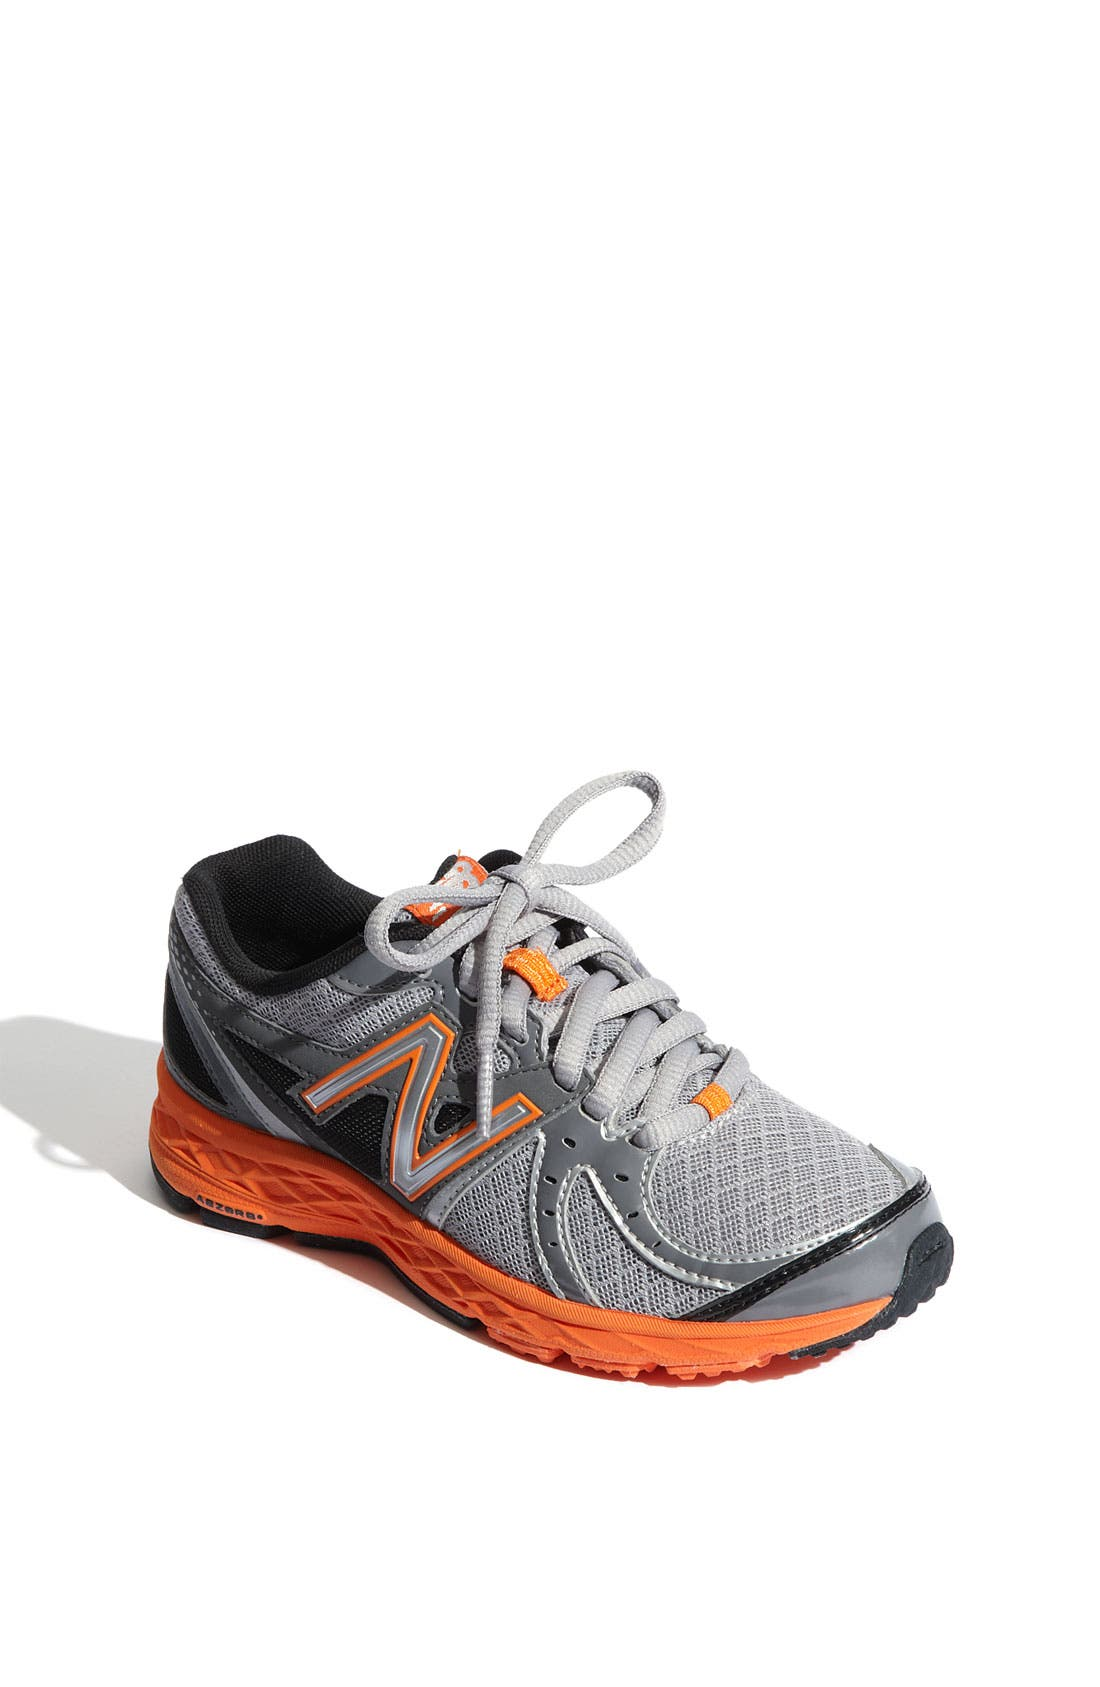 Main Image - New Balance '790' Trail Running Shoe (Toddler, Little Kid & Big Kid)